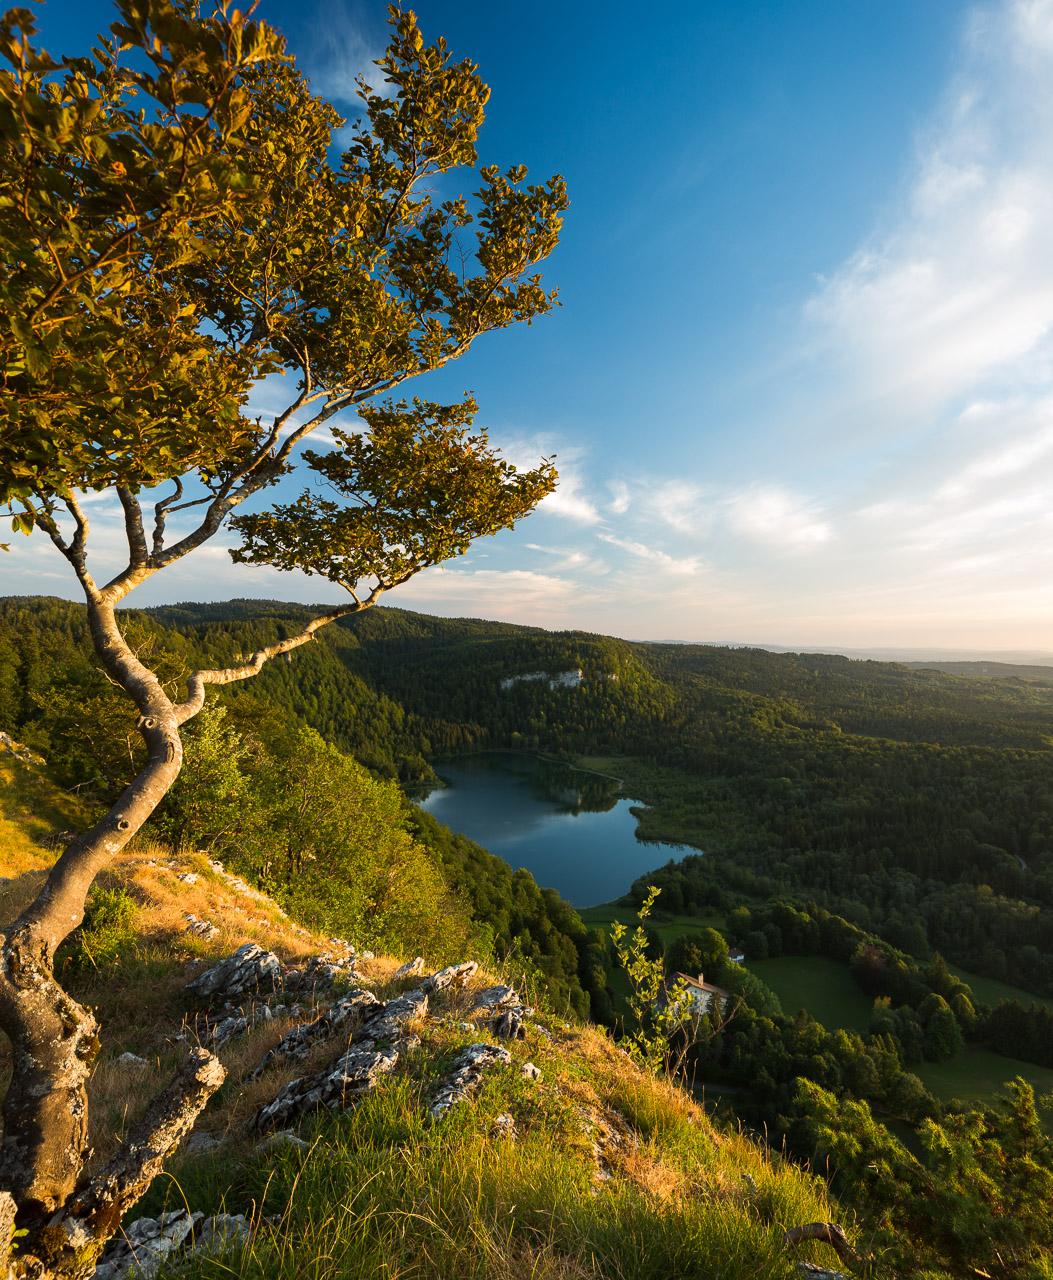 lac_bonlieu-2752.jpg